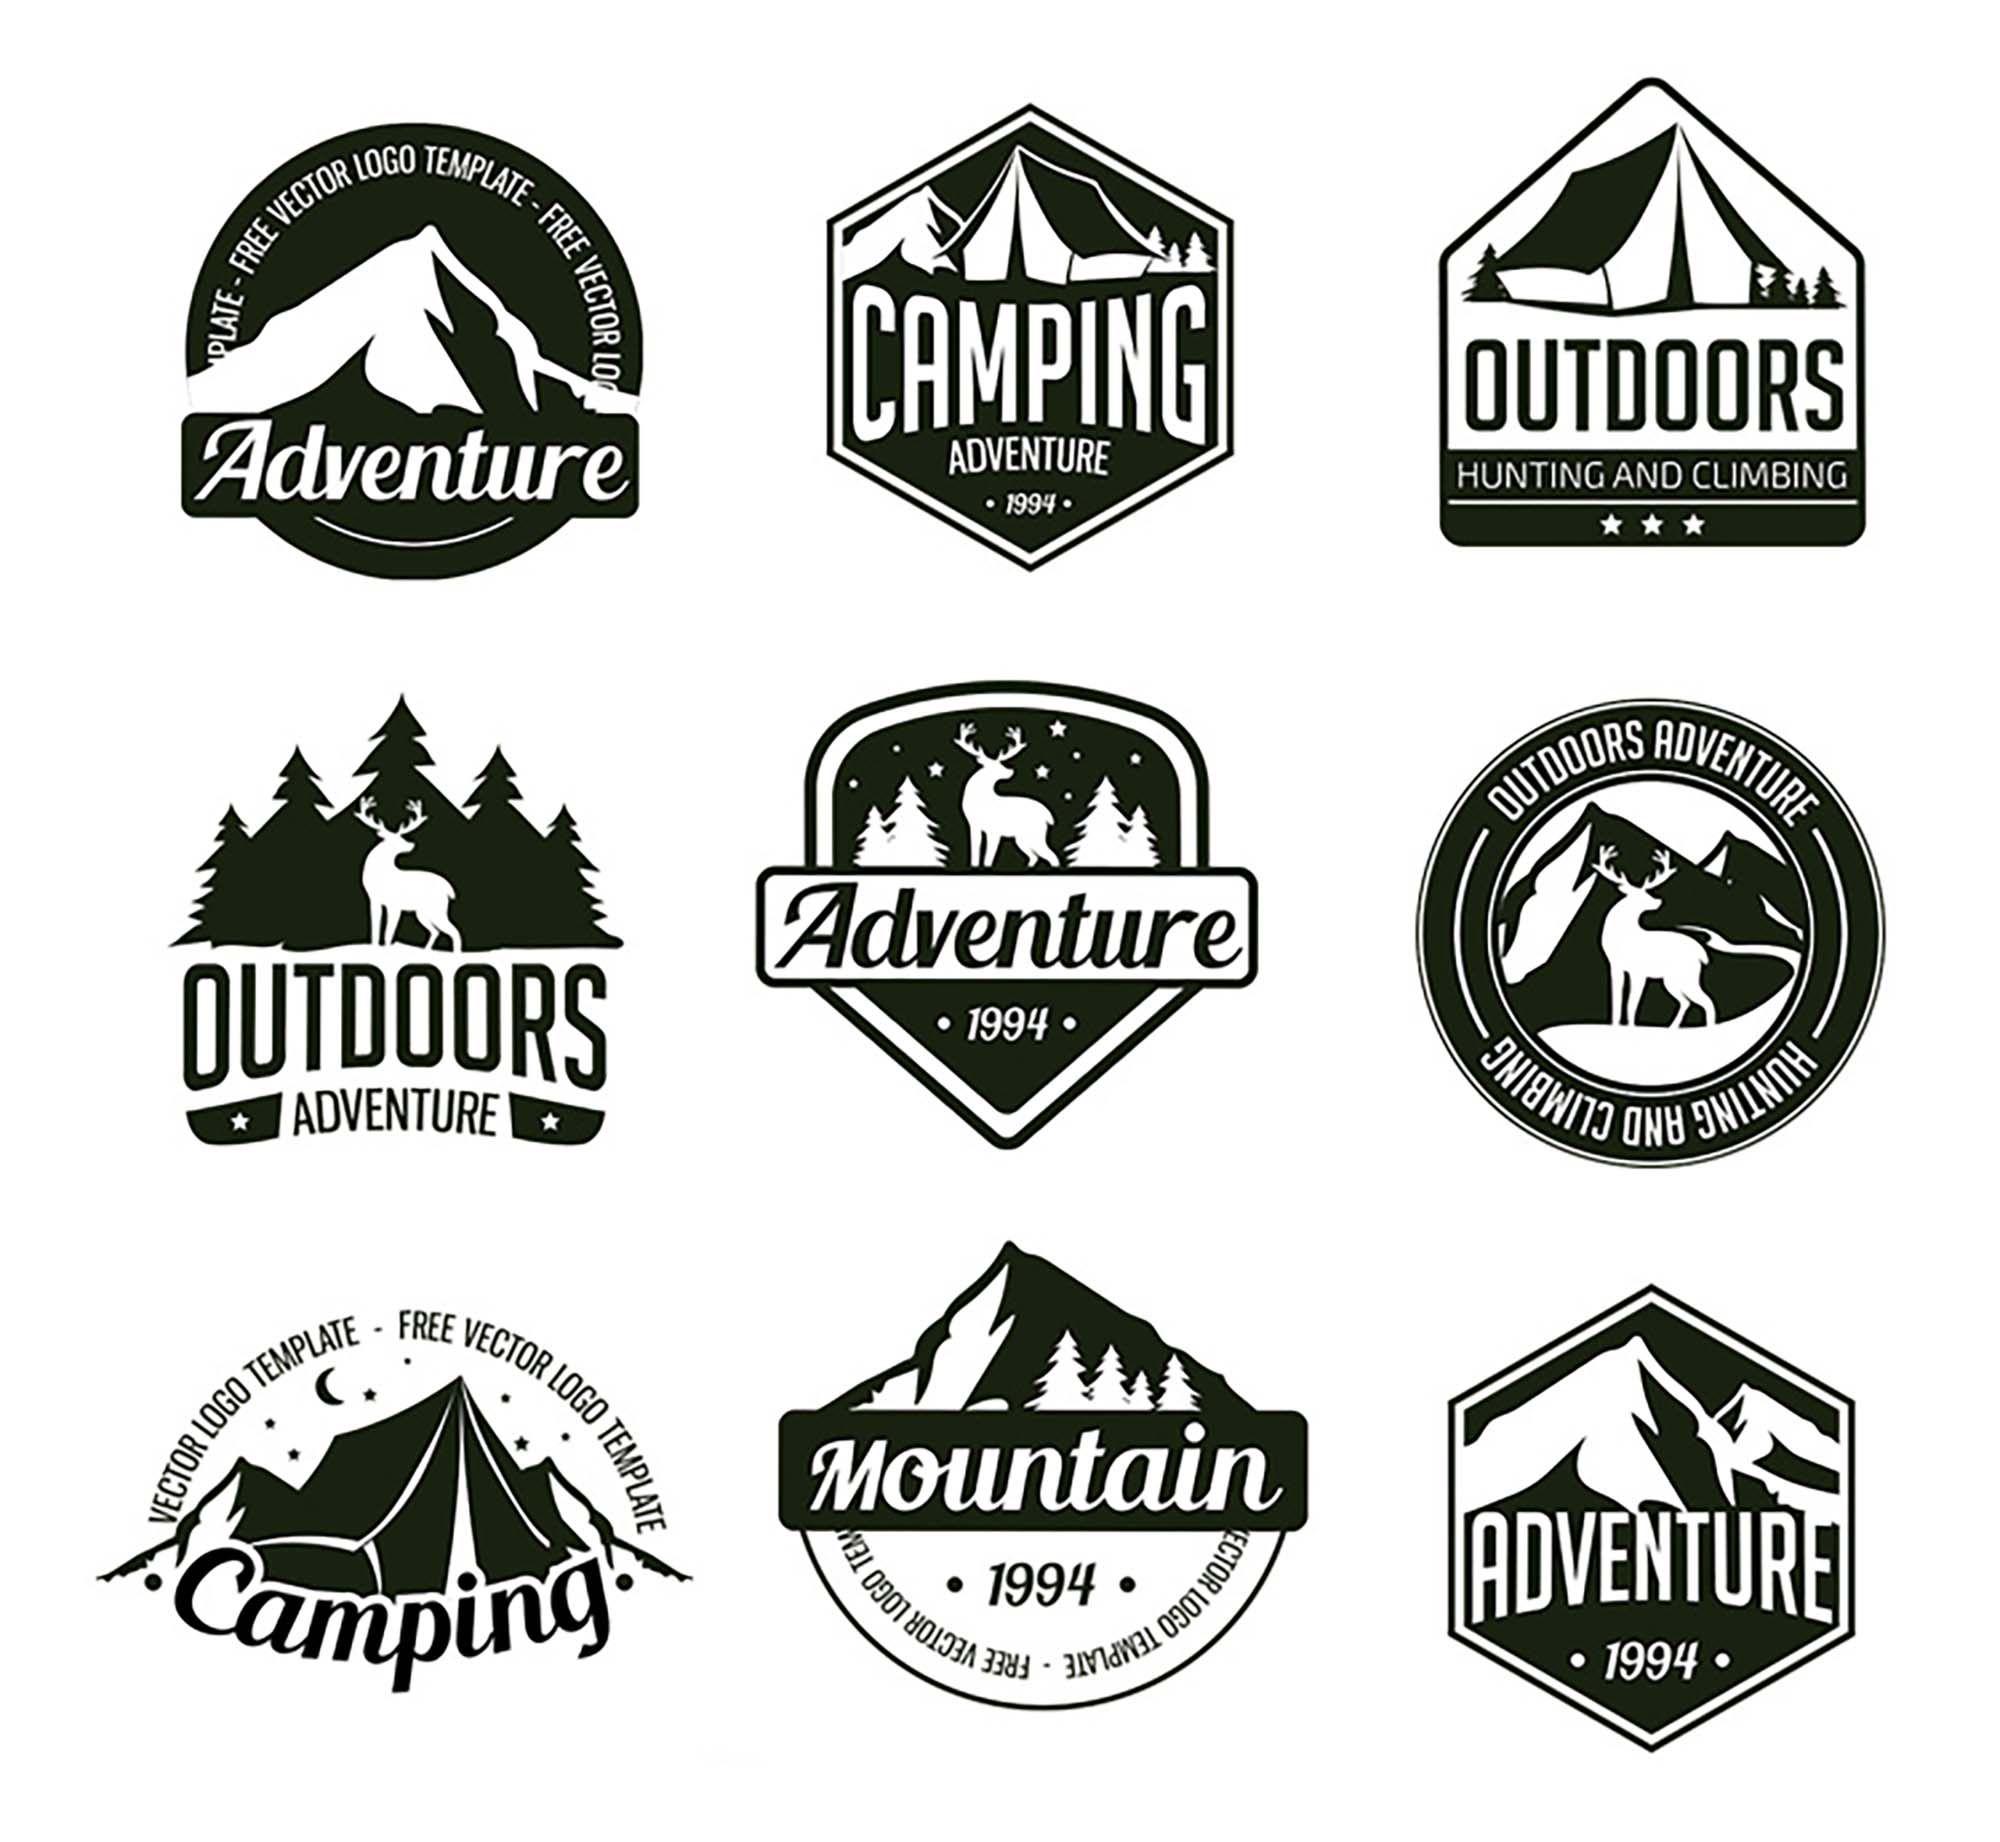 001 Outstanding Free Logo Template Psd Inspiration  Photoshop MockupFull